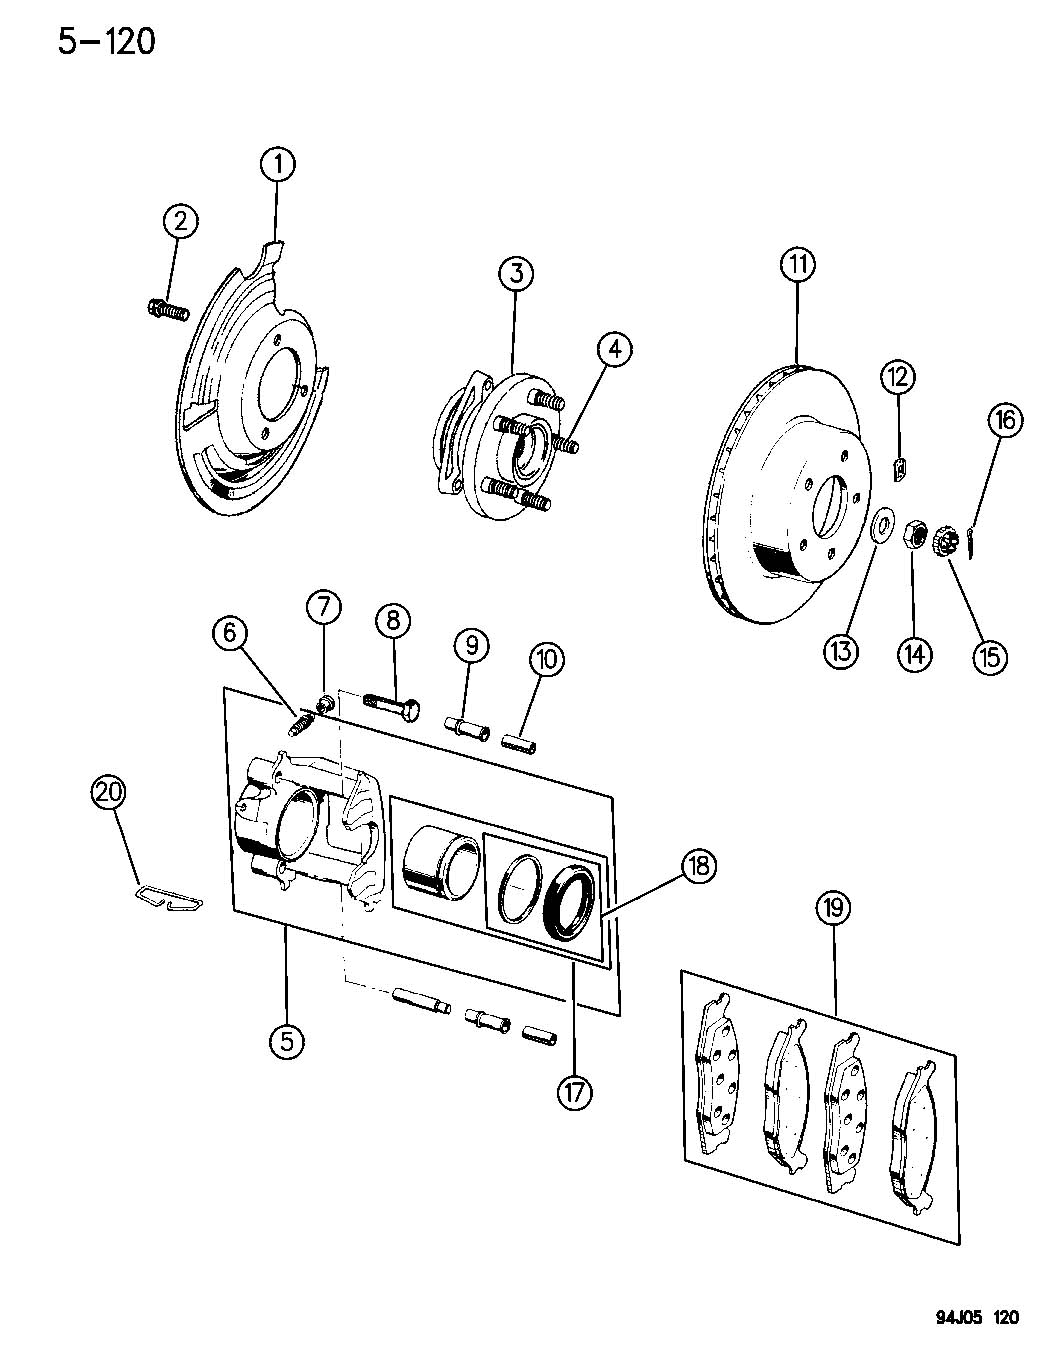 1994 Jeep Grand Cherokee Rear Brake Diagram Best Secret Wiring Drum Brakes Front 1997 96 Diagrams